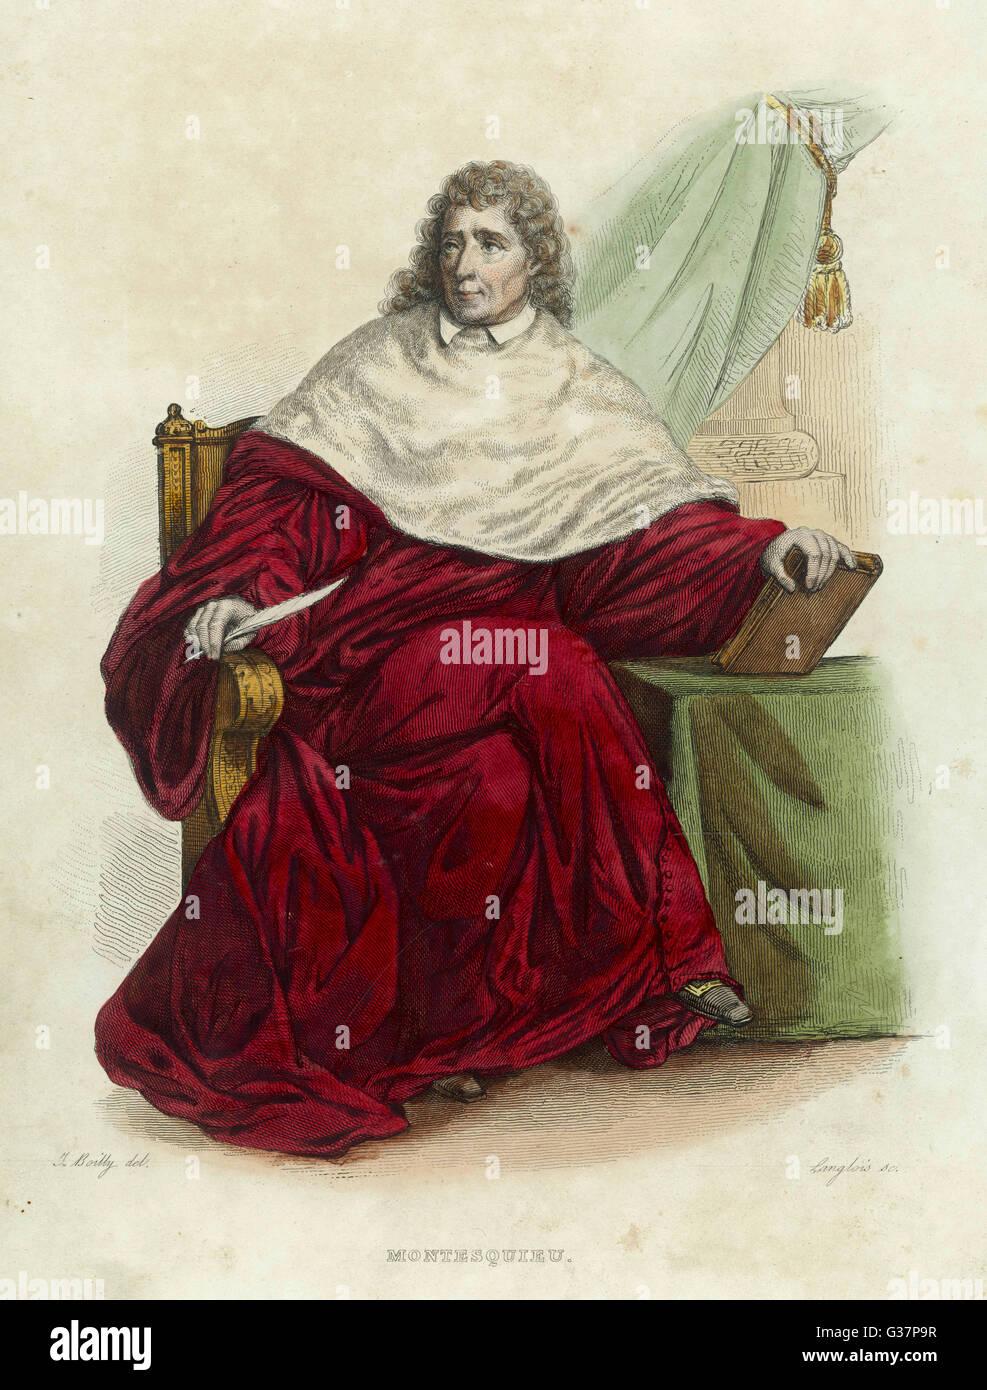 baron de montesquieu was an enlightenment philosopher from